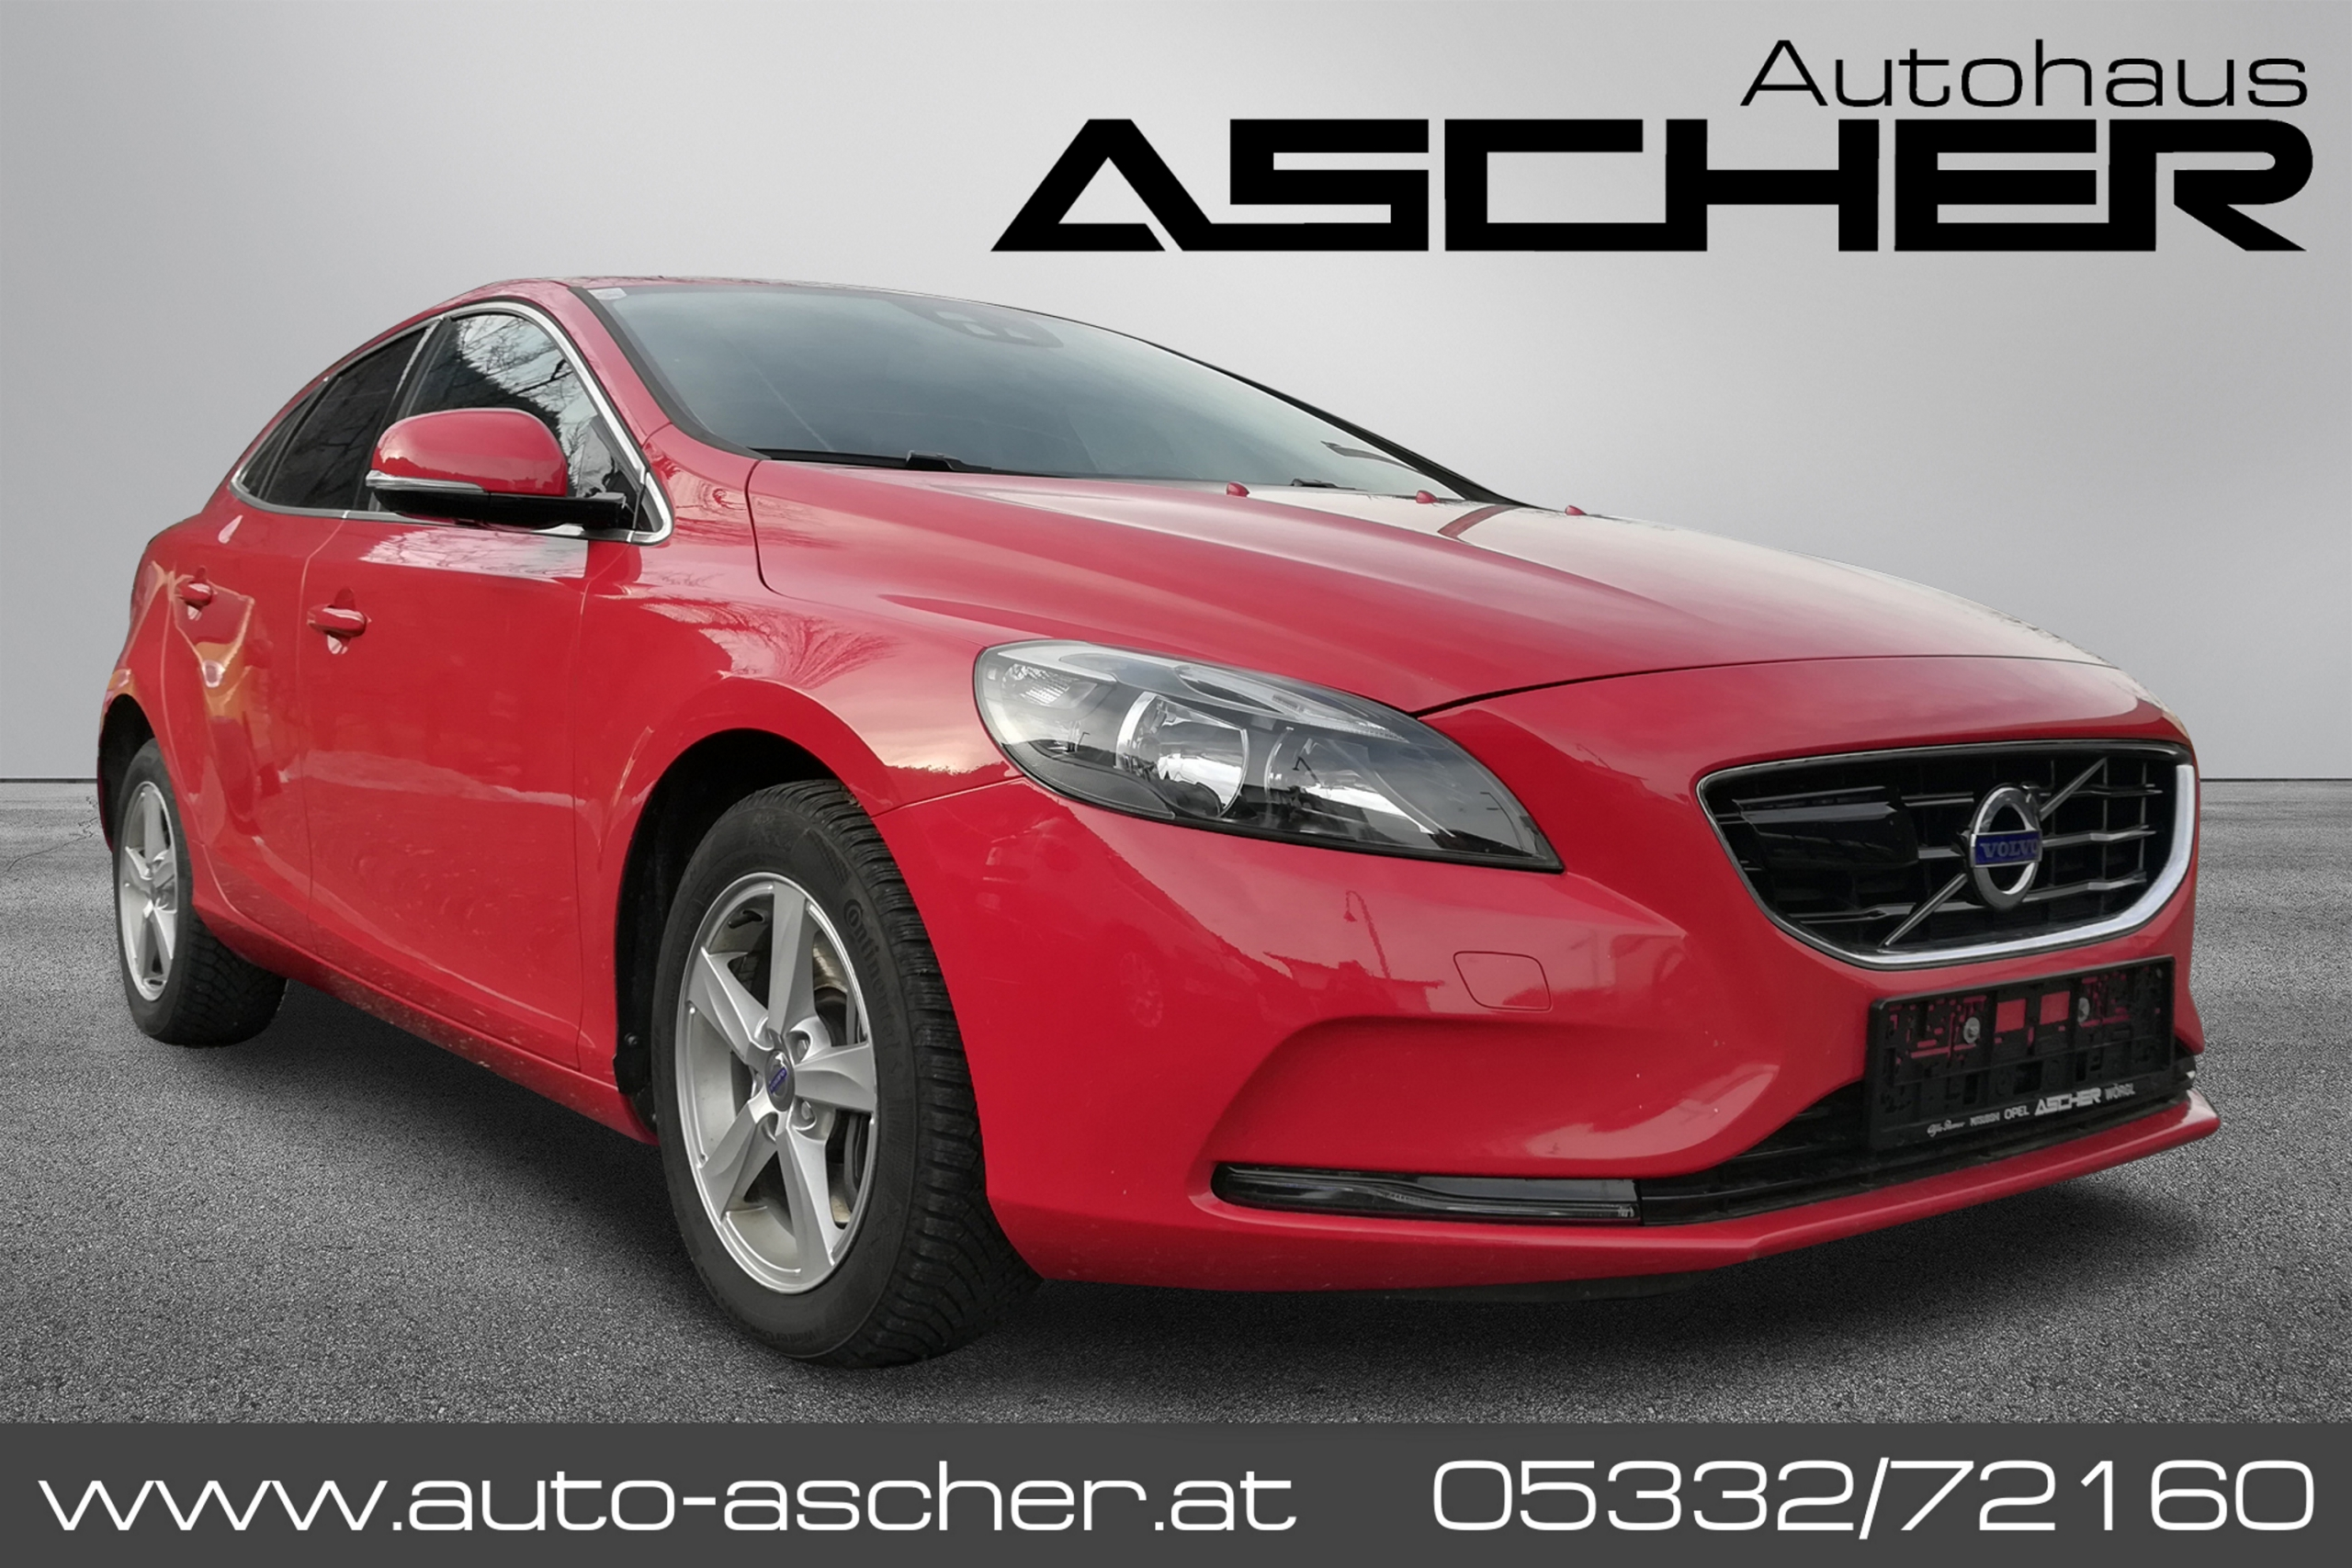 Fotoservice Auto Ascher